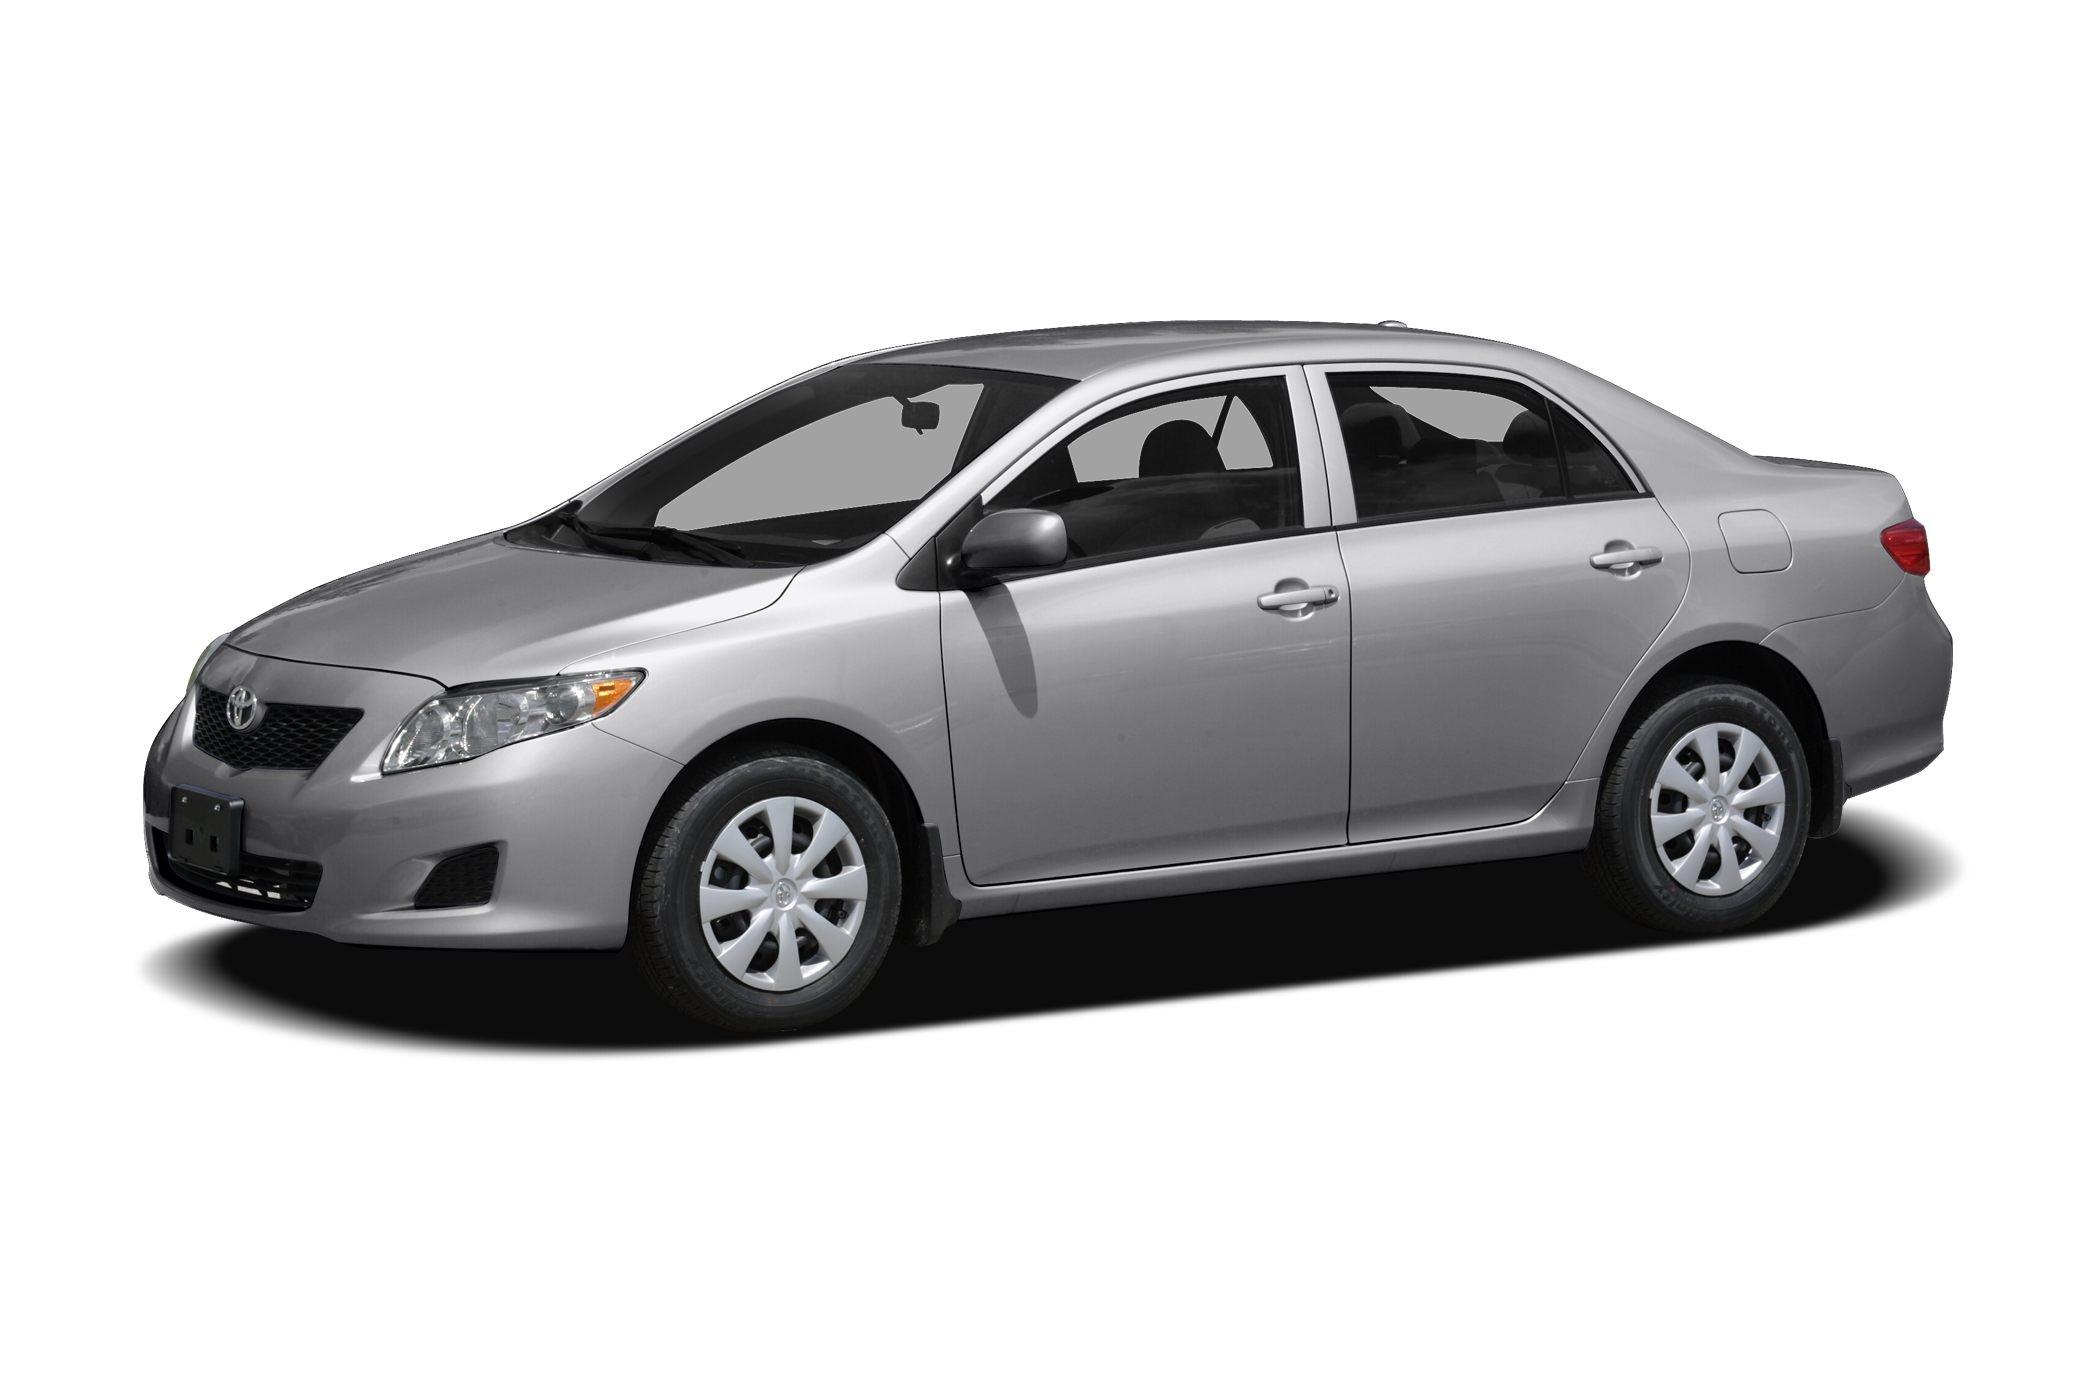 2010 toyota Corolla Parts Diagram 2010 toyota Corolla Owner Reviews and Ratings Of 2010 toyota Corolla Parts Diagram